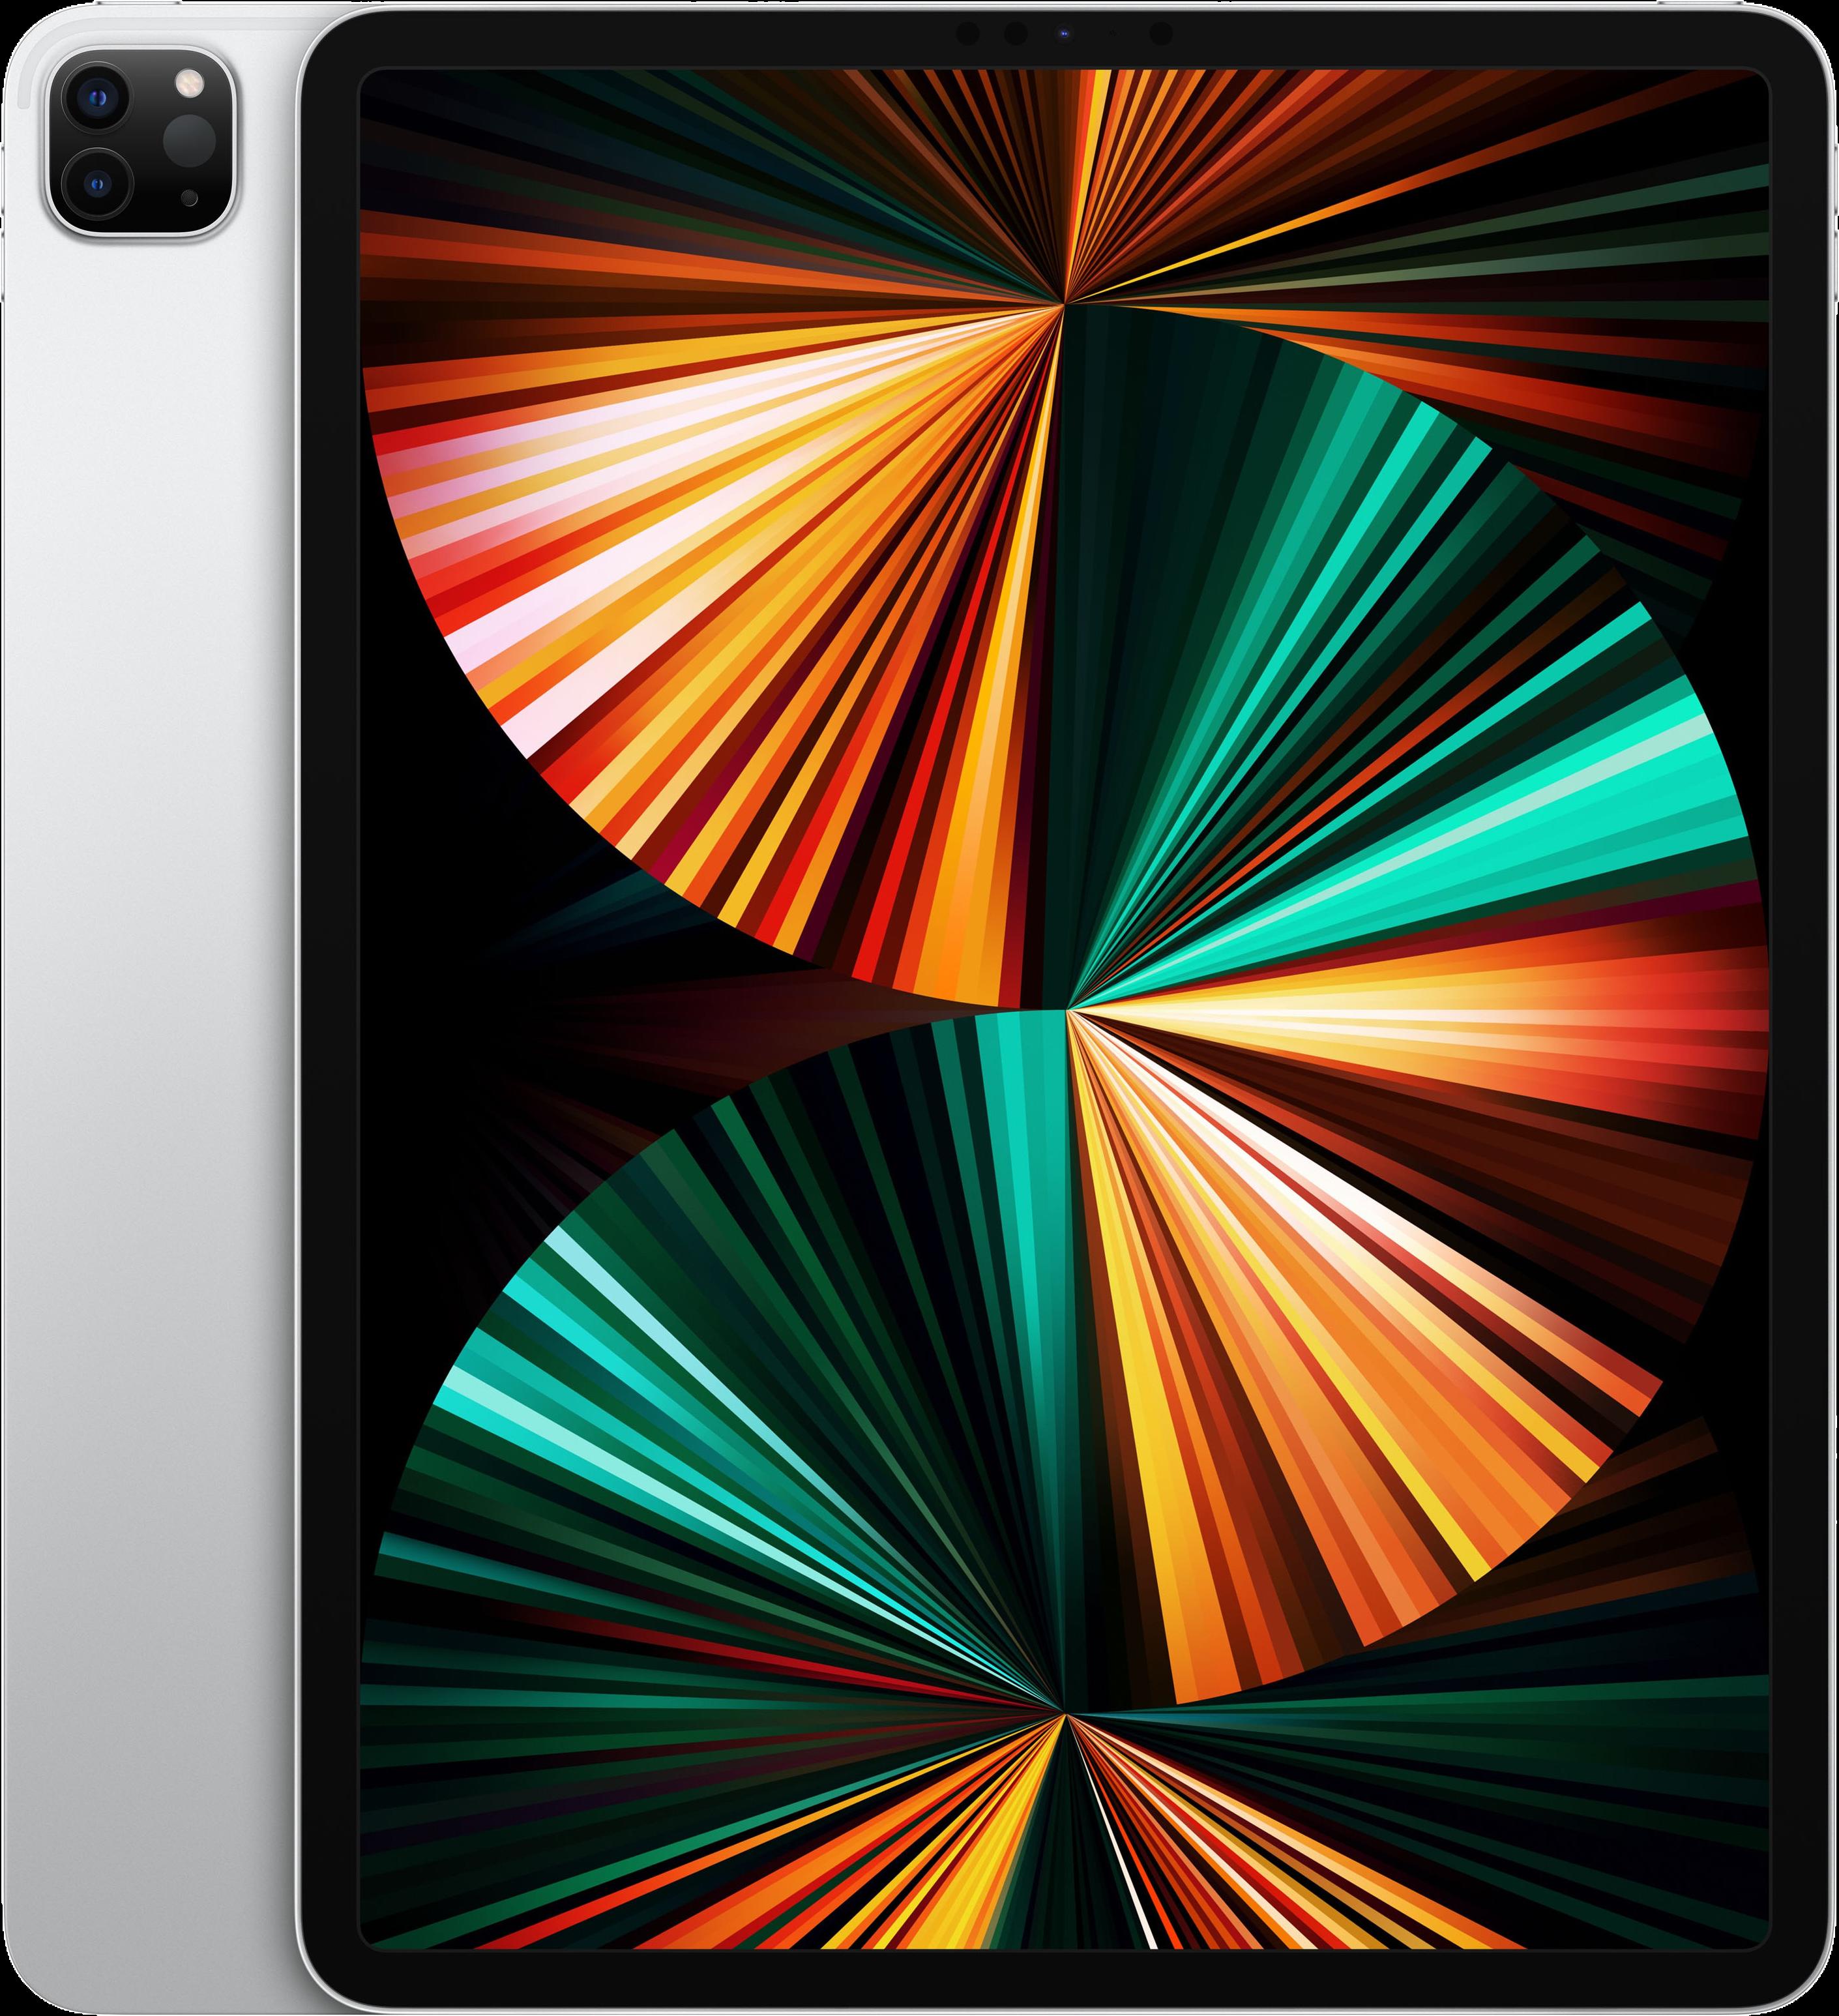 "Apple 12.9"" iPad Pro (2021) - Wi-Fi + Cellular - iOS 14 - 128GB"